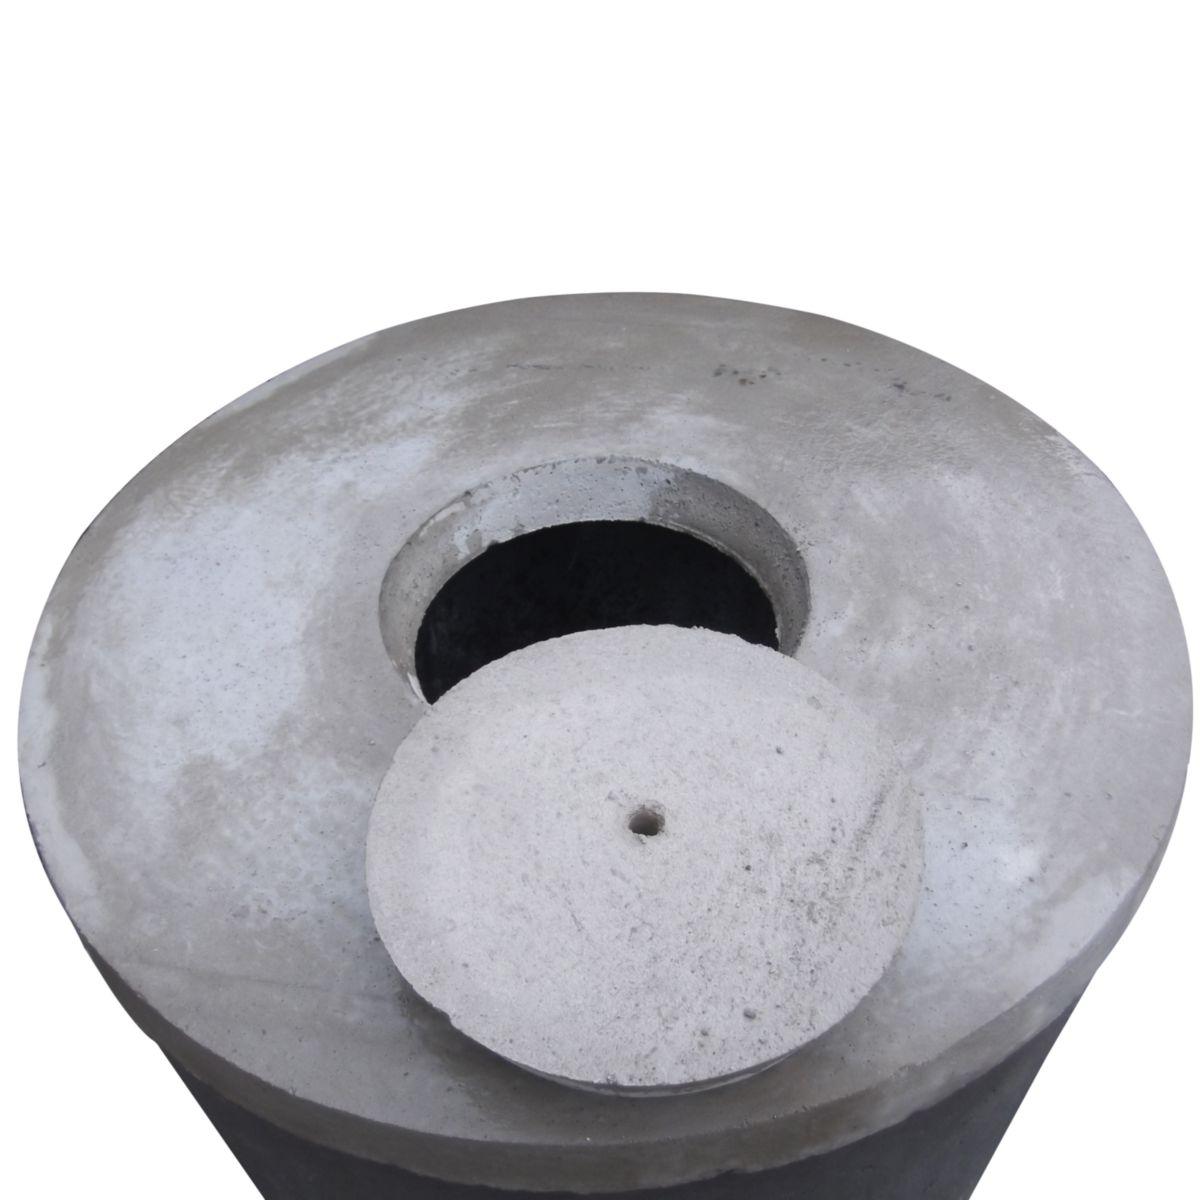 tampon fosse septique affordable beton b branch couvercle. Black Bedroom Furniture Sets. Home Design Ideas